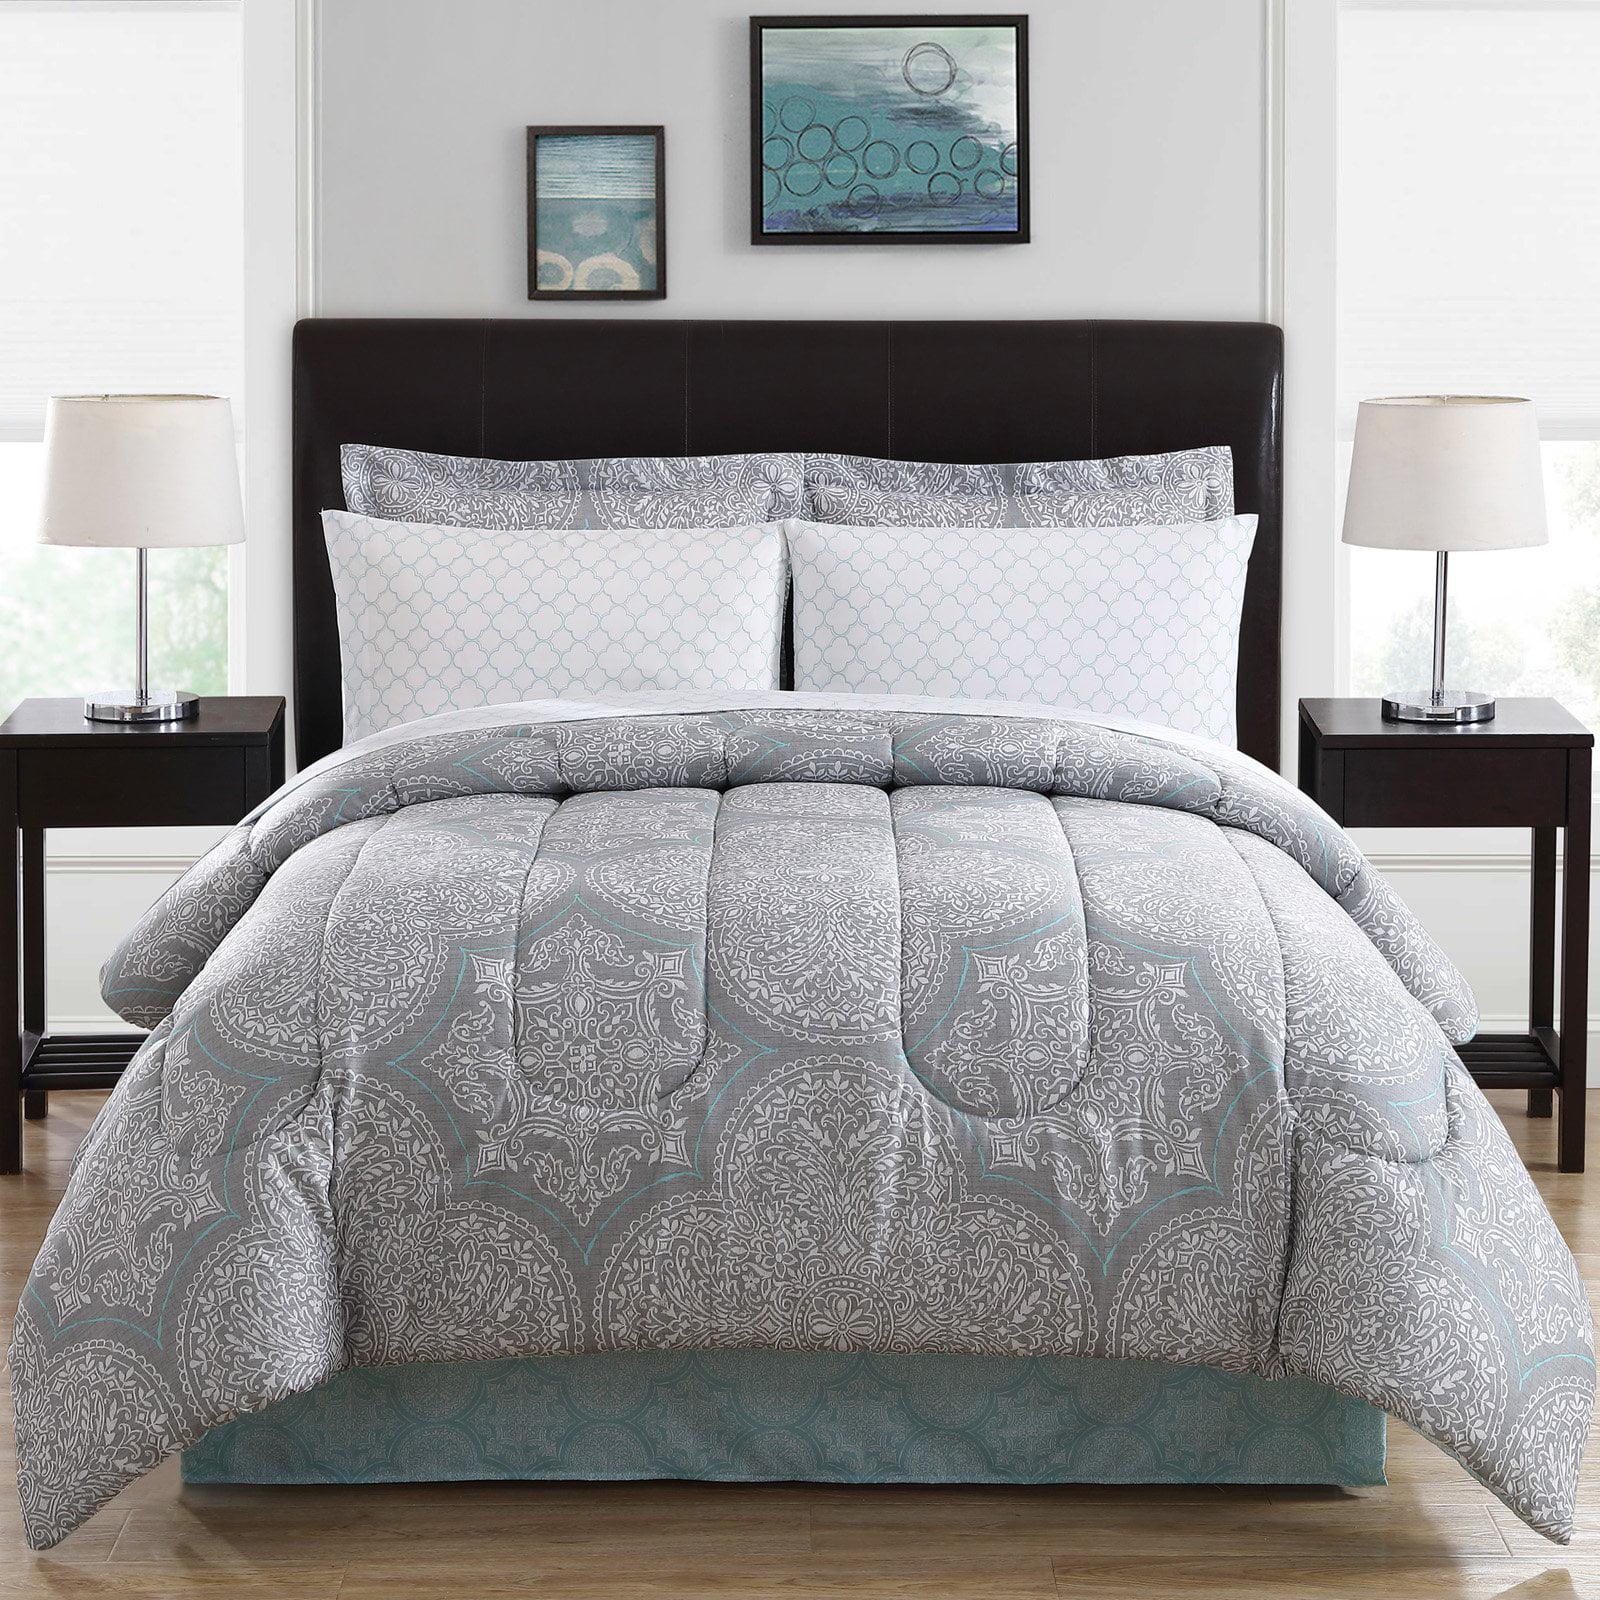 Silverton Bed in a Bag by Ellison